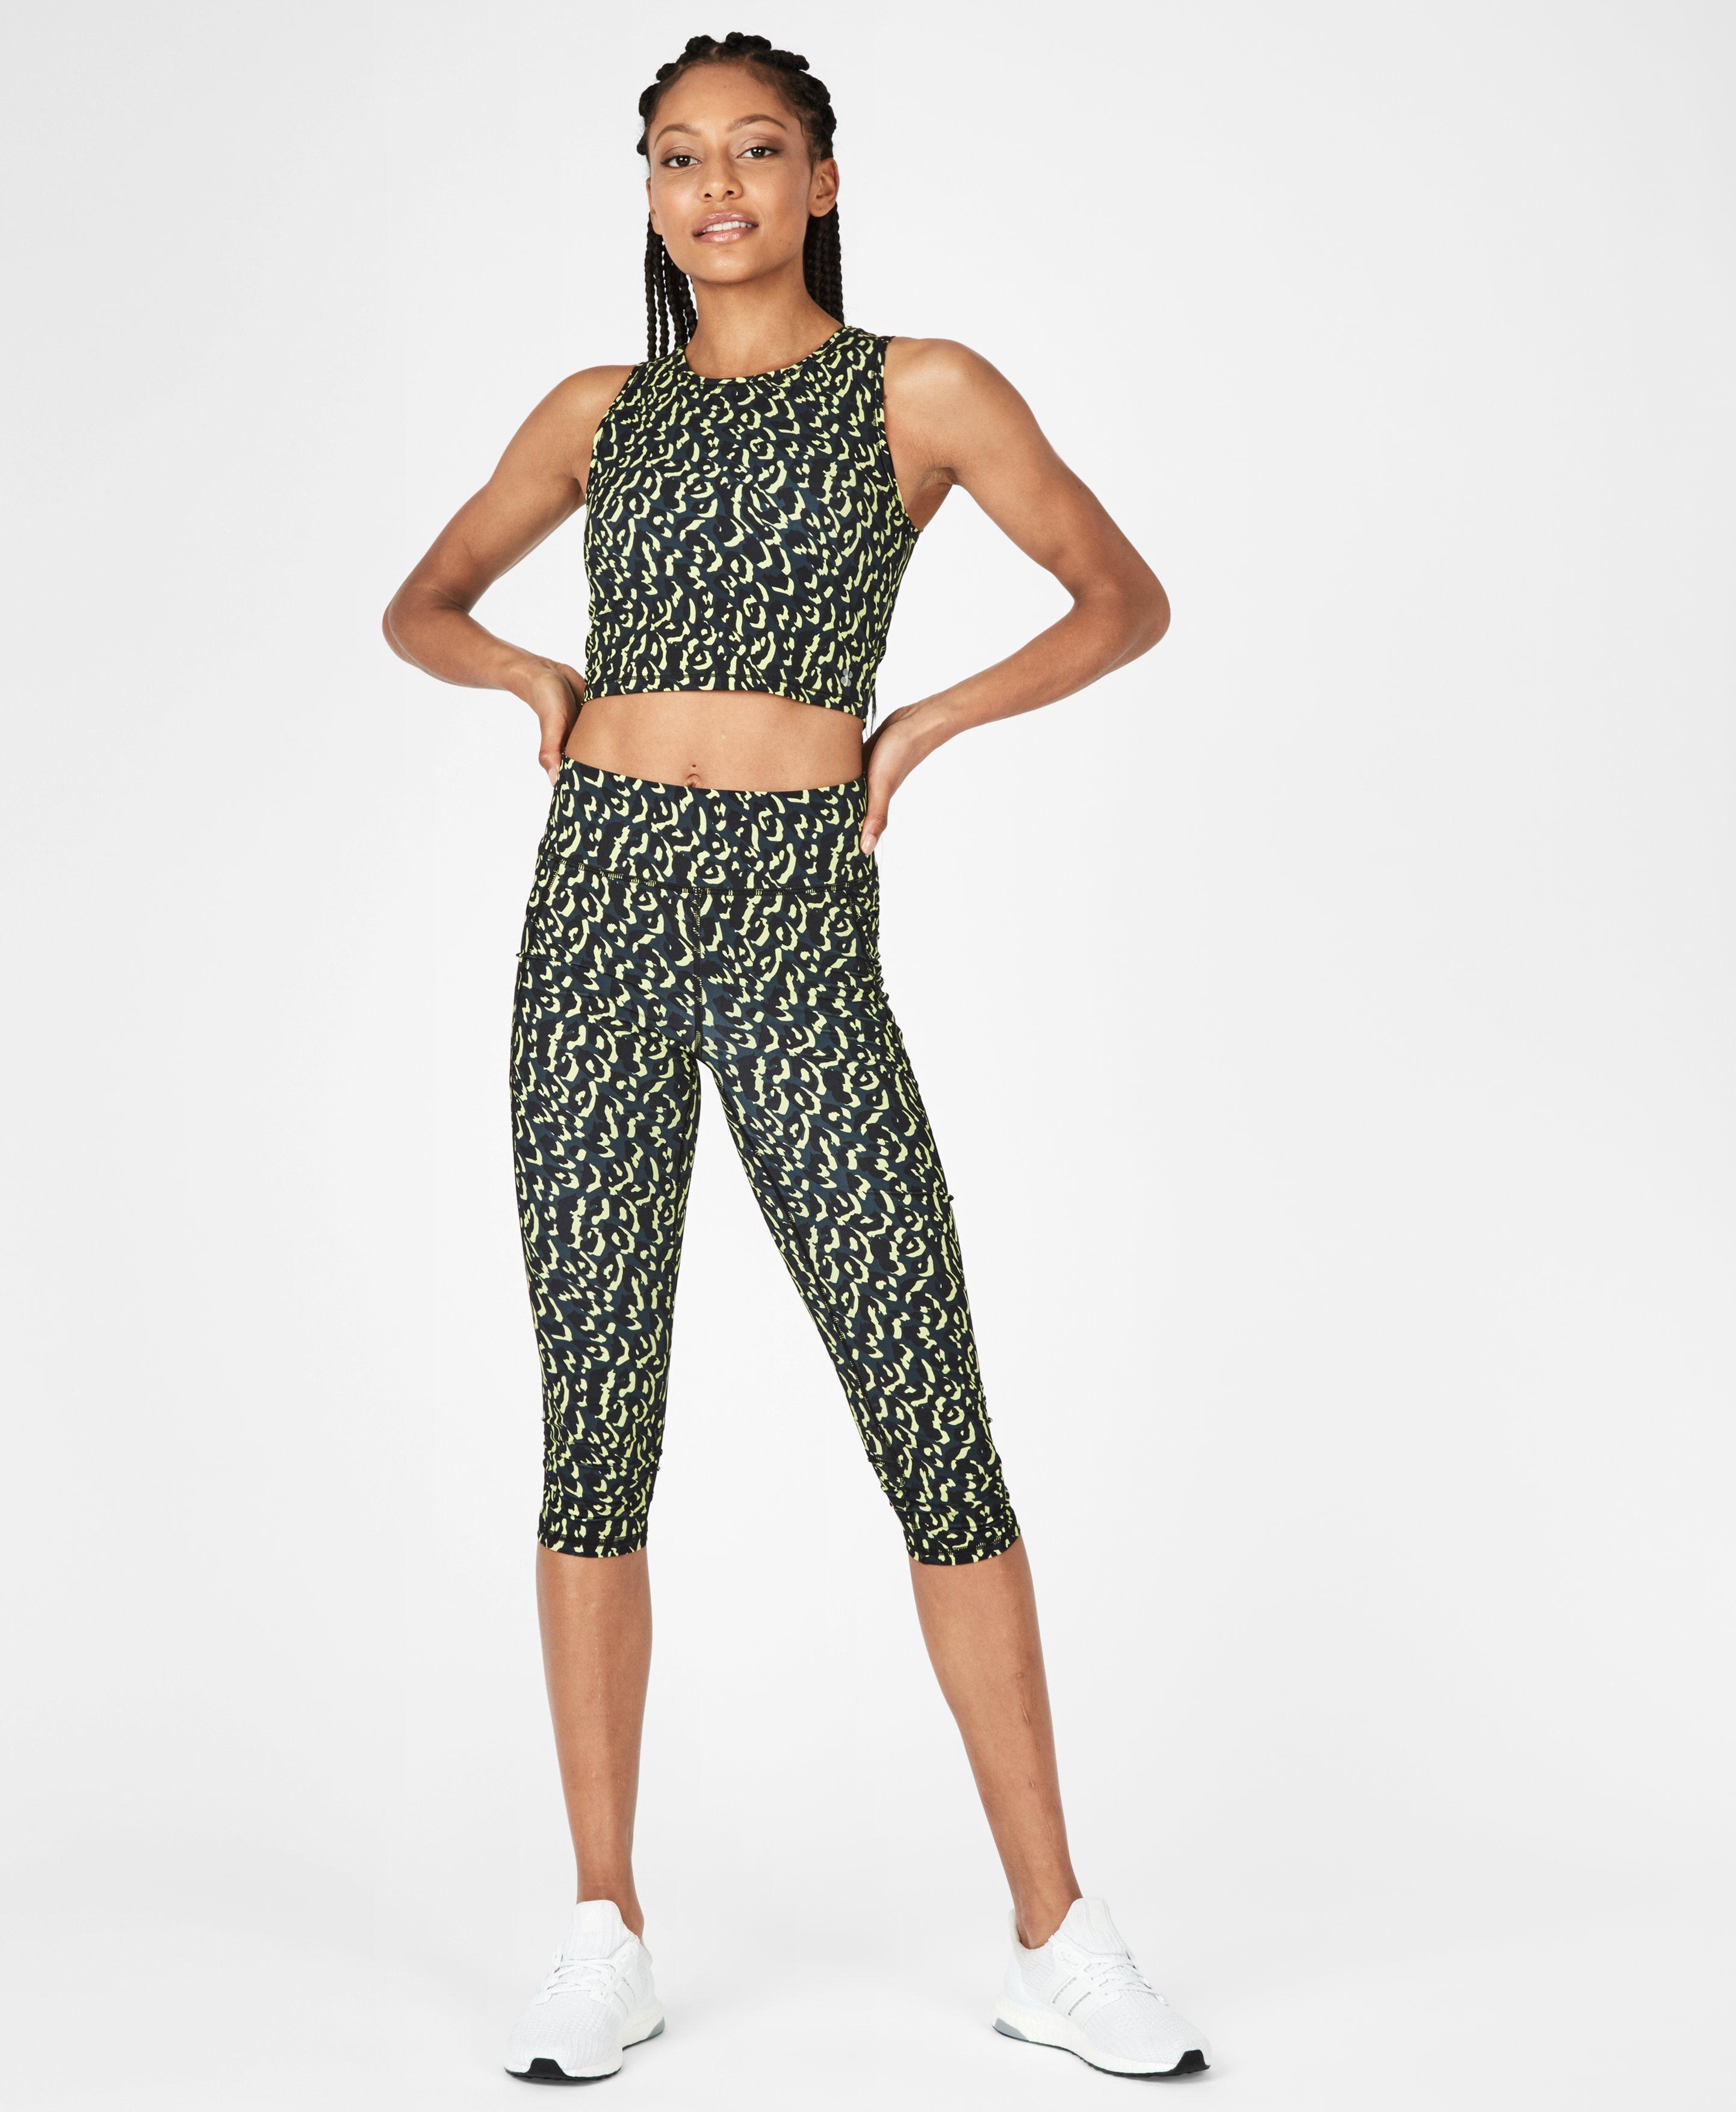 Zero Gravity Citrus Leopard Print Set,  | Sweaty Betty